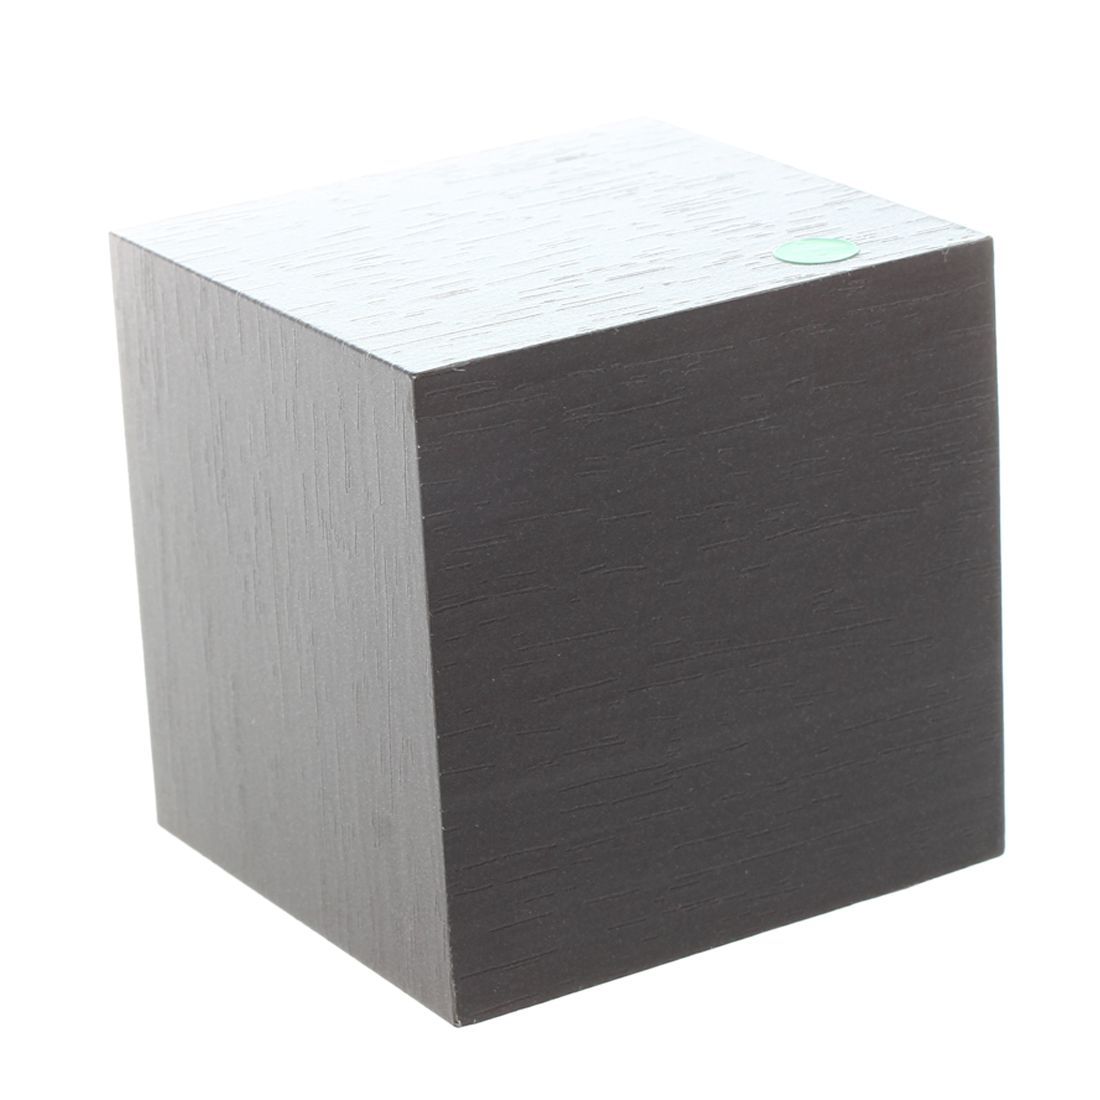 Wood Cube LED Alarm Control Digital Desk Clock Wooden Style Room Temperature Black wood green led